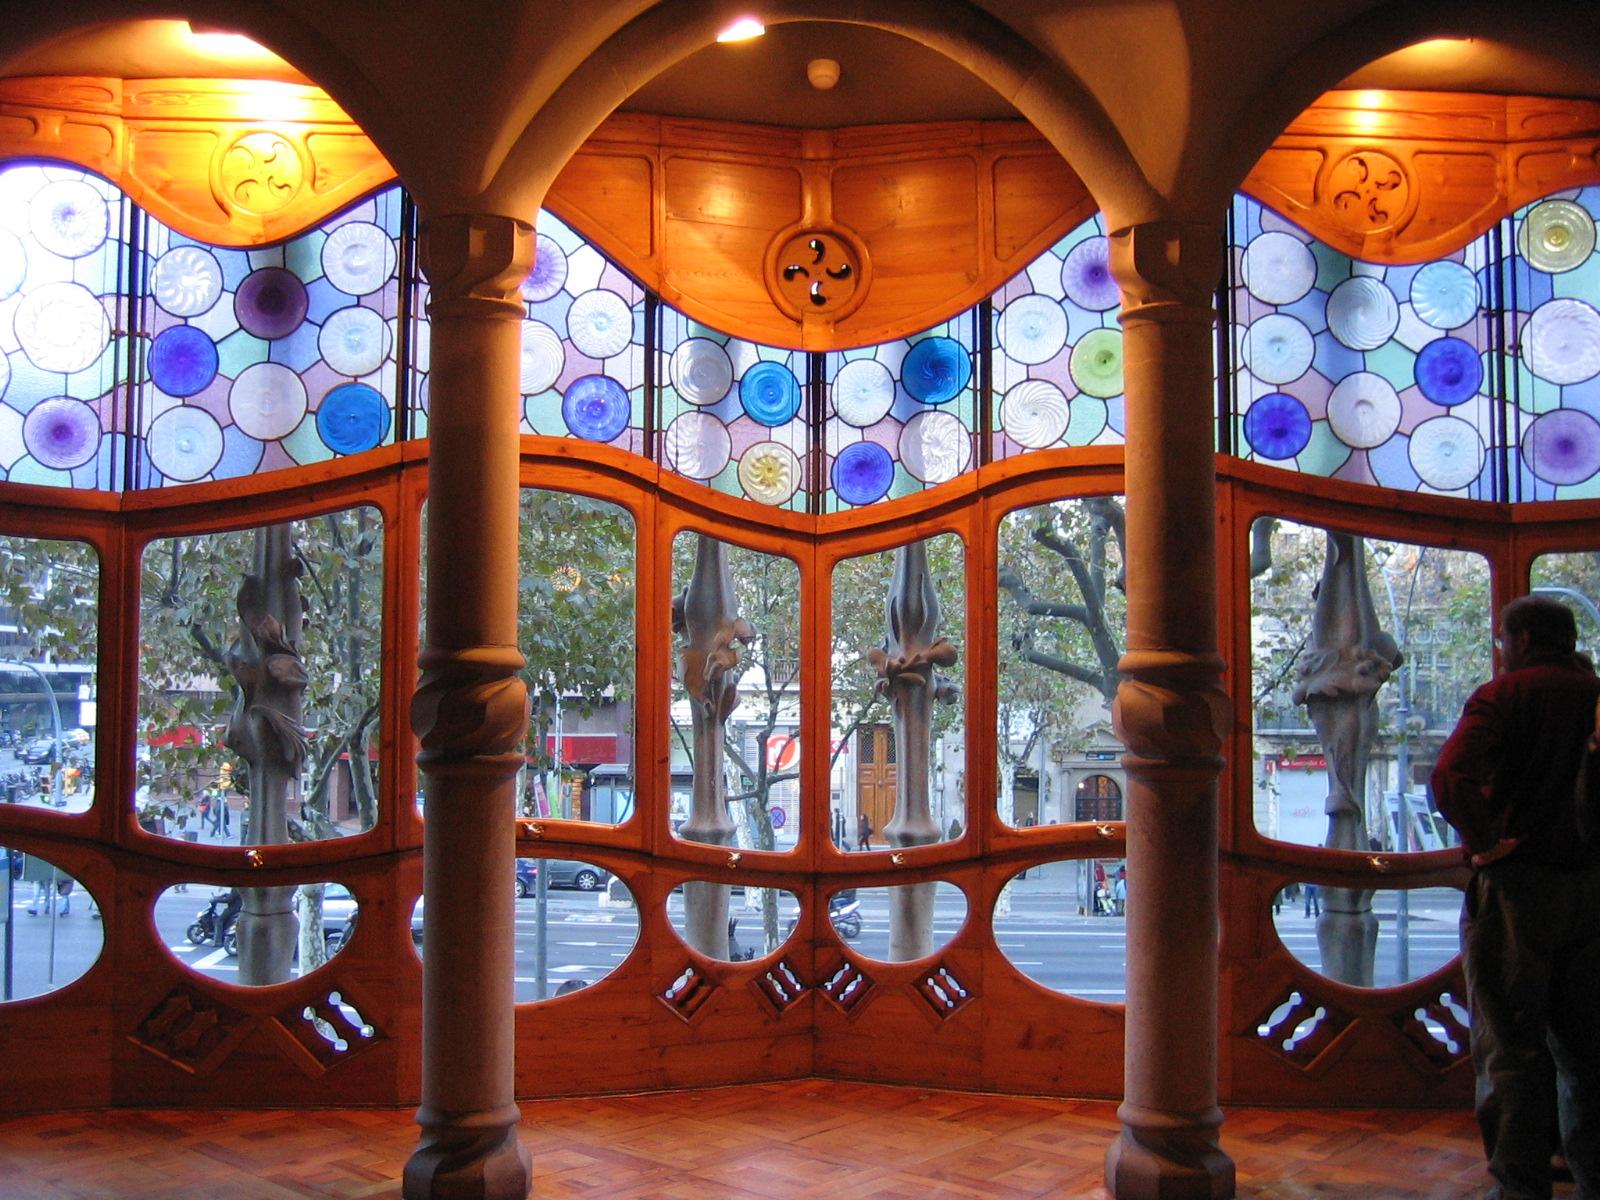 File:Casa Batlló PisPrincipal Interior.jpg - Wikimedia Commons